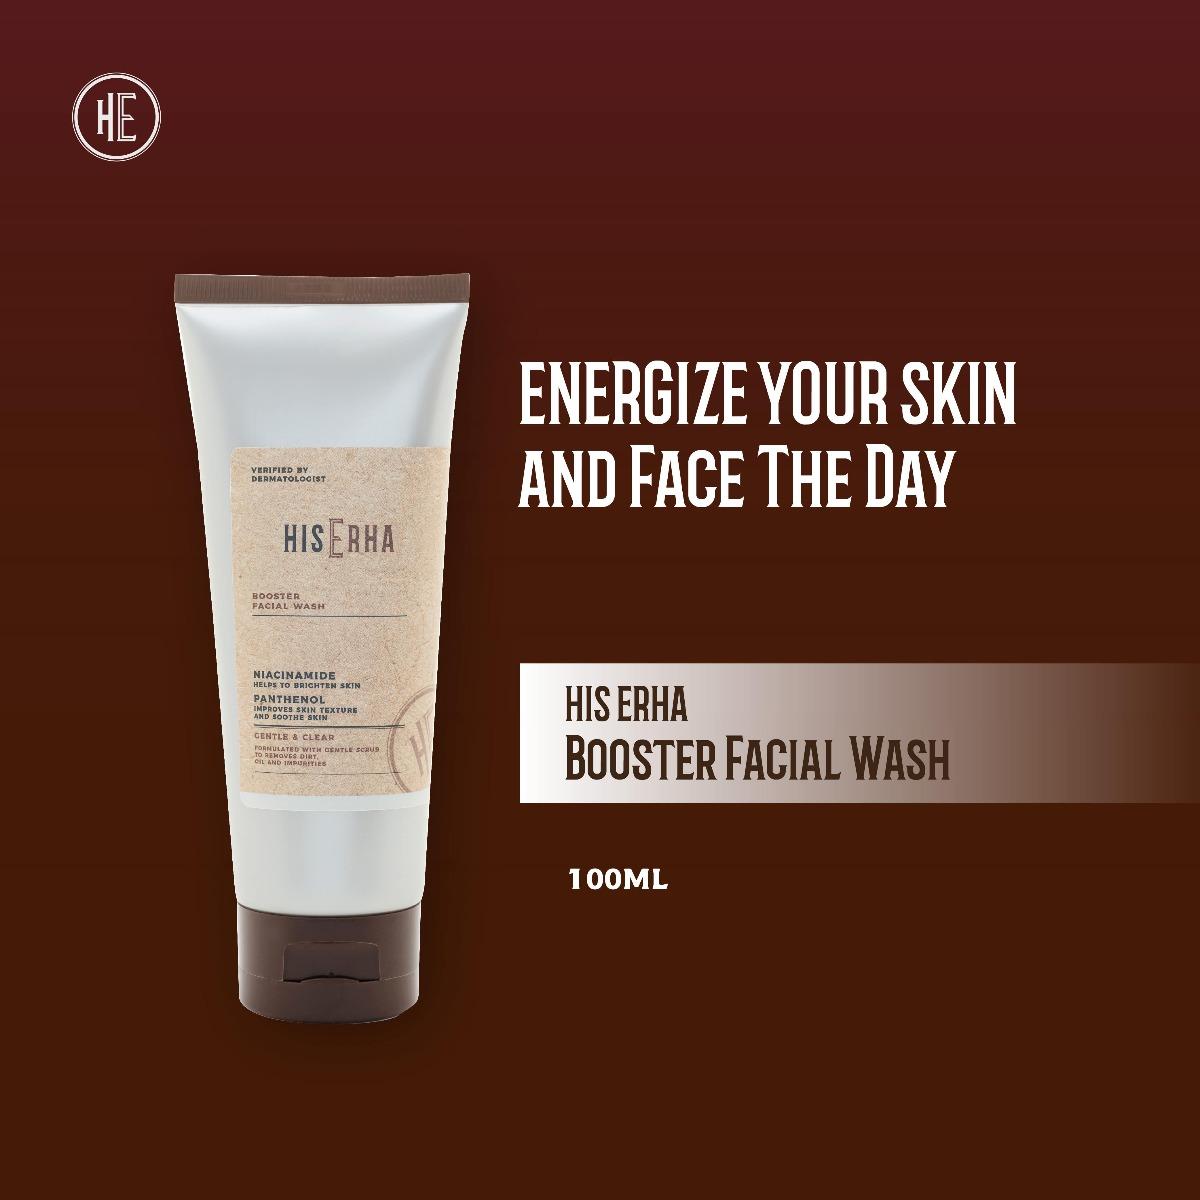 HIS ERHA Booster Facial Wash